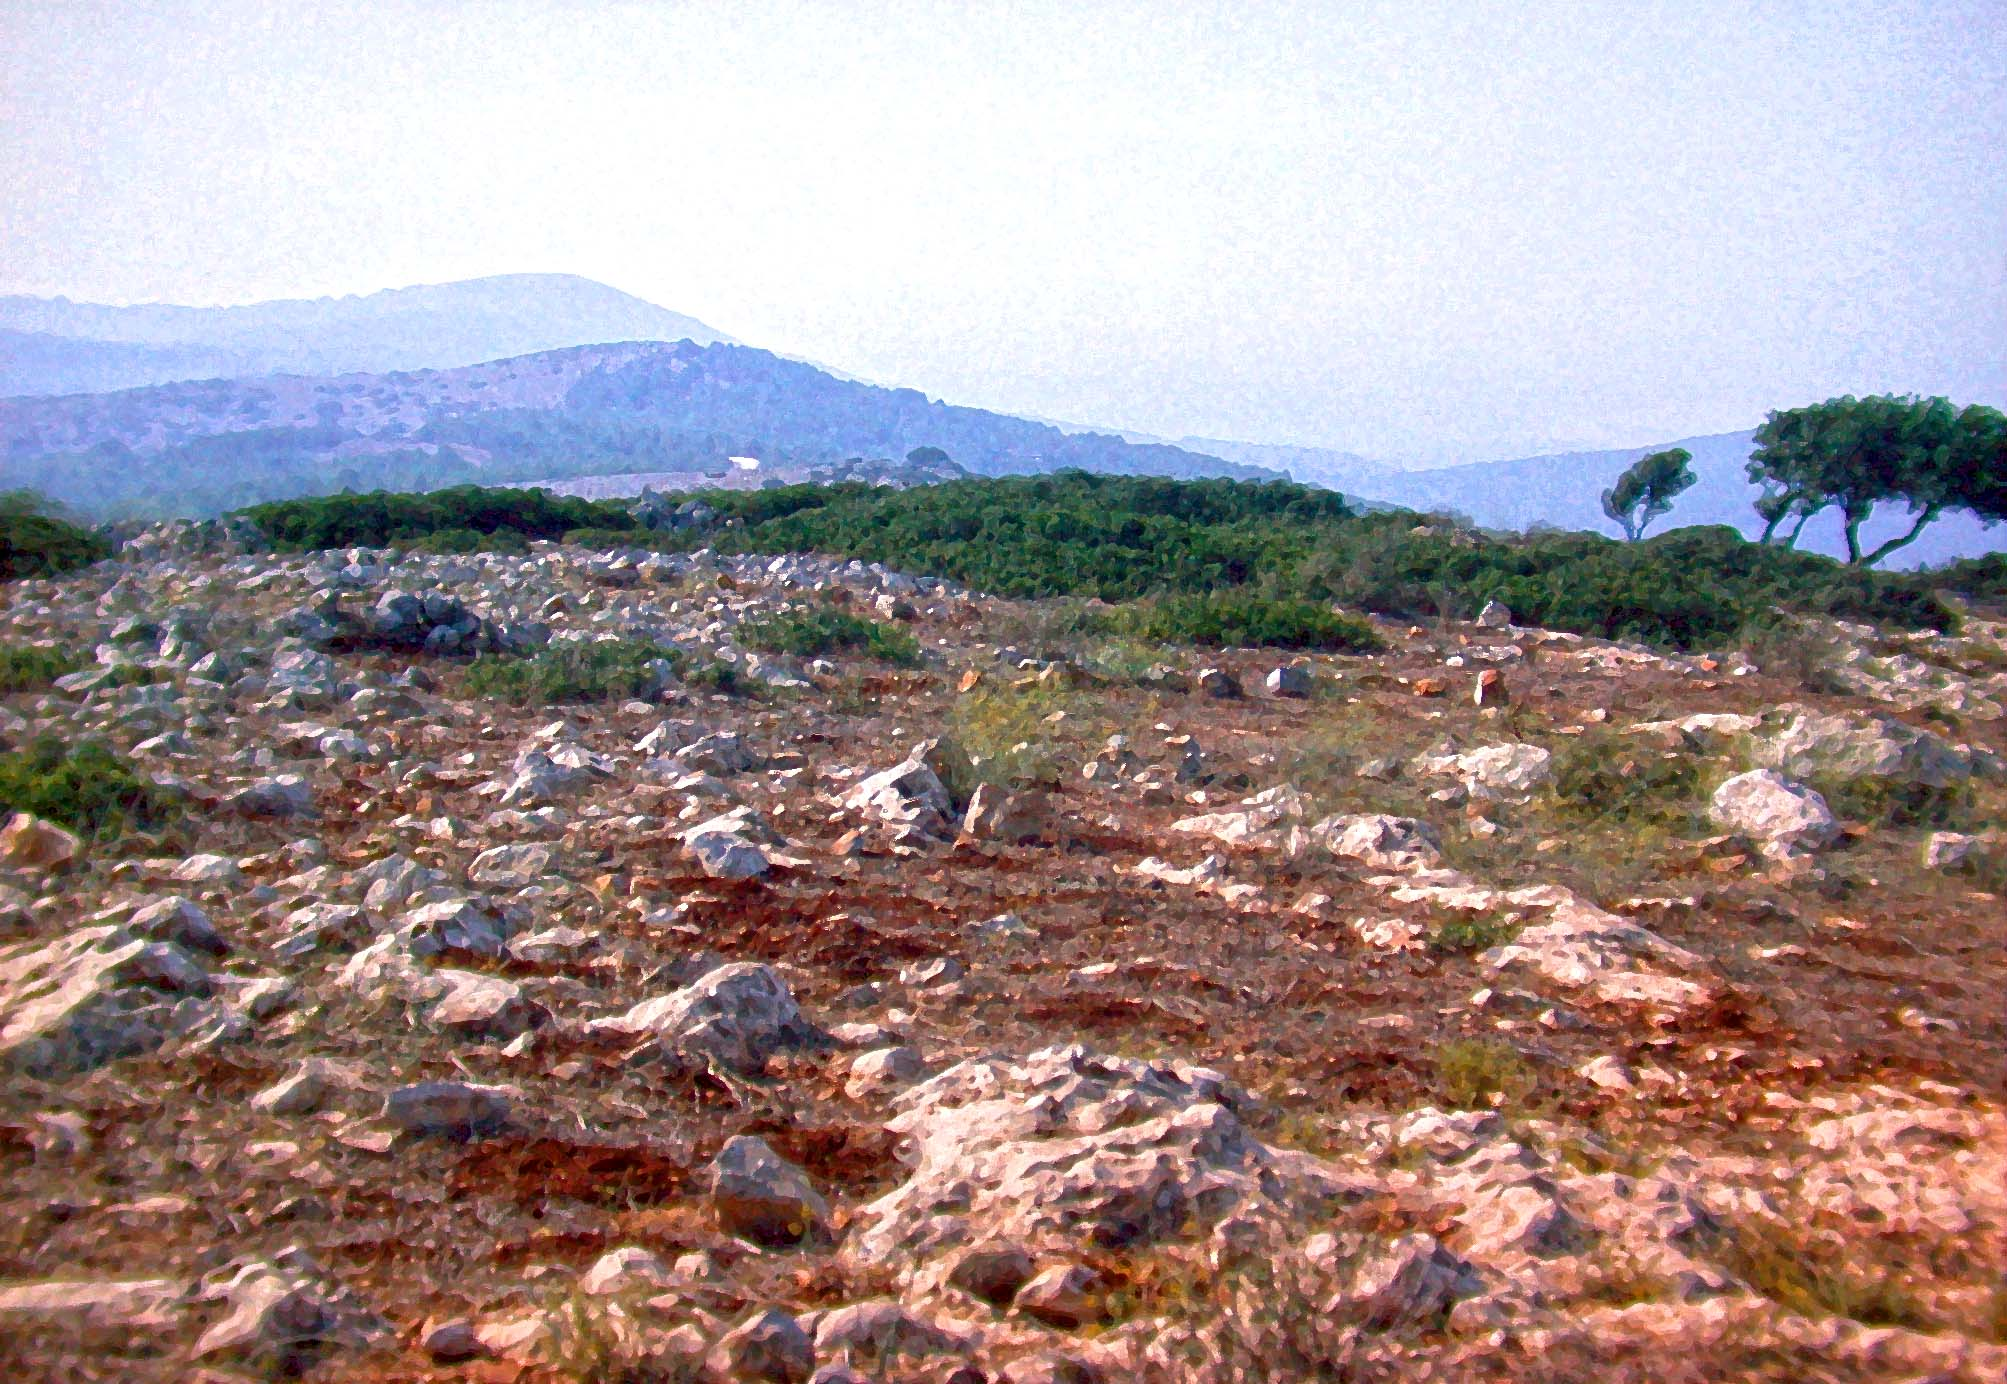 Gilboa summit